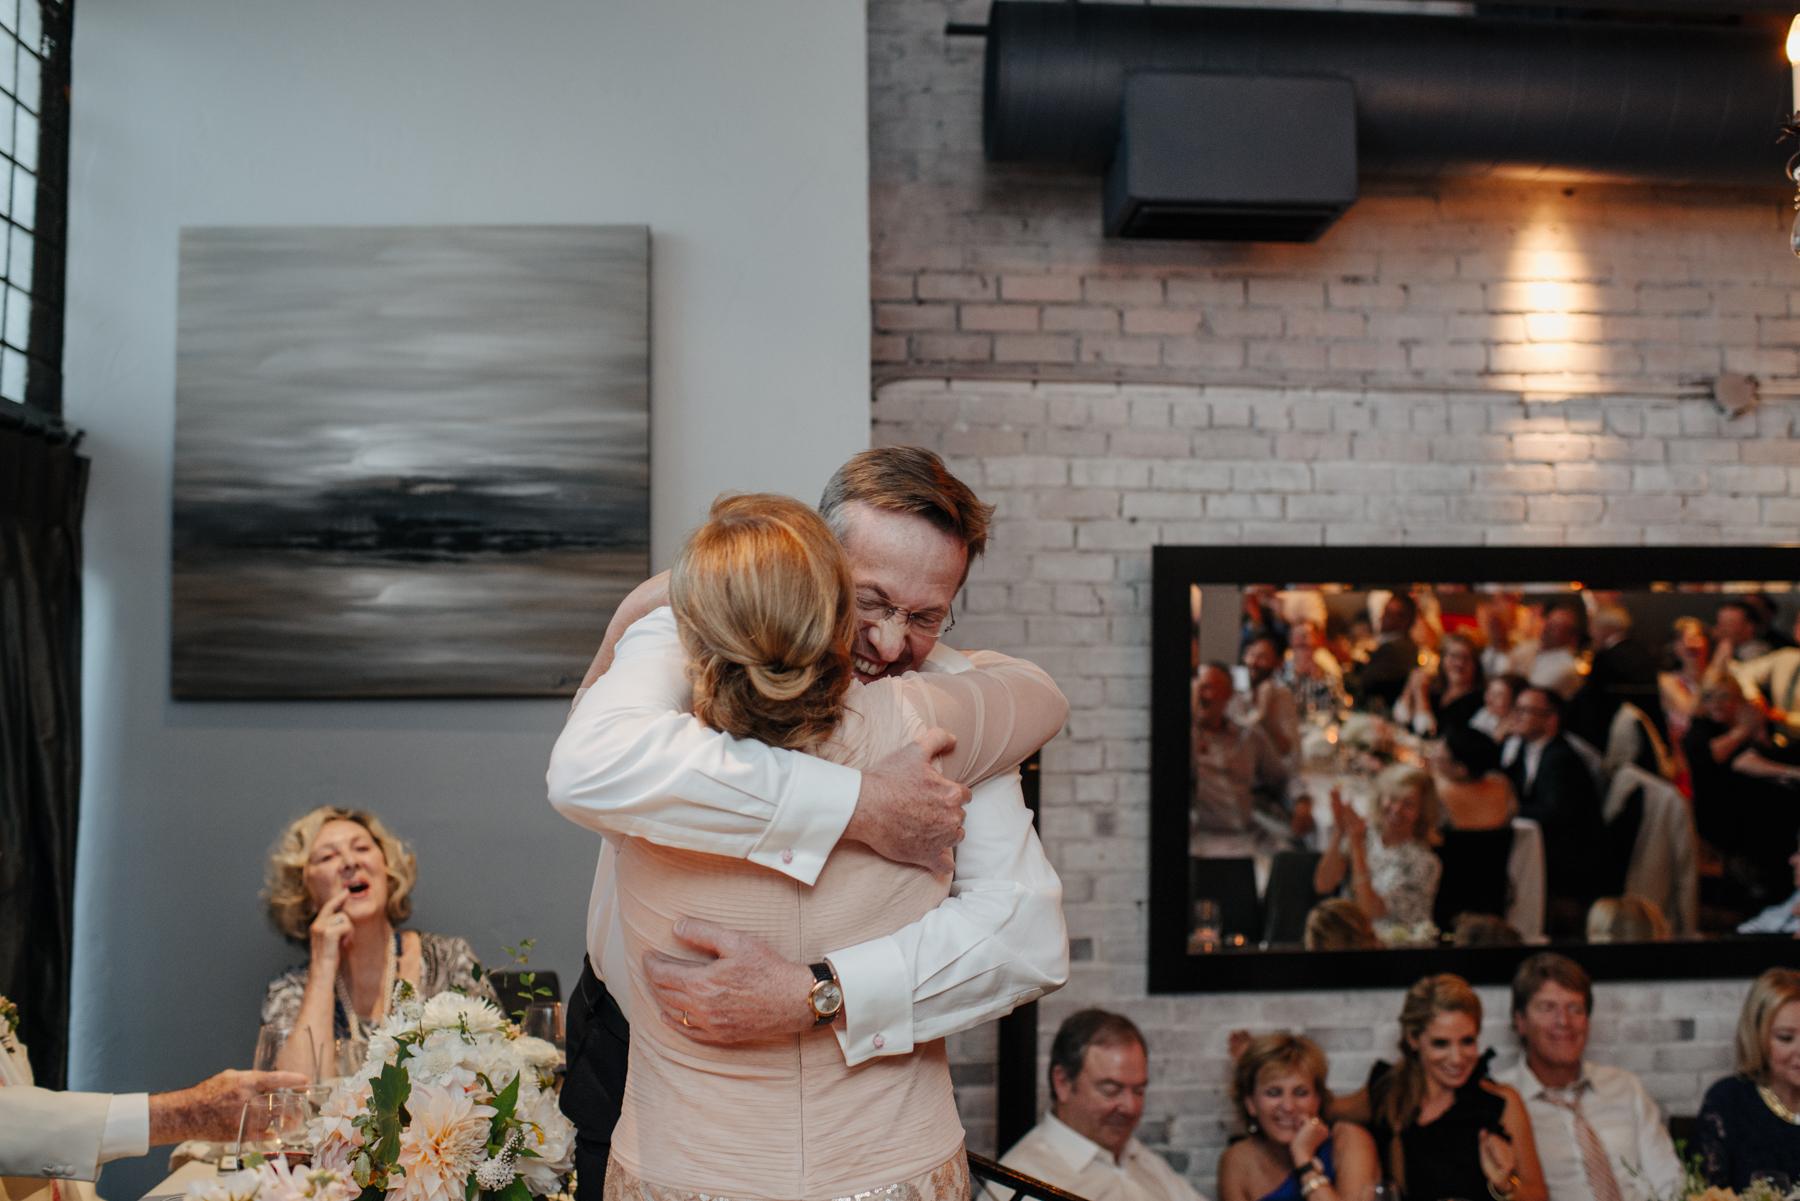 kaoverii_silva_photographer_cynthia_richard_wedding_vancouver_brix_&_mortar-35.jpg